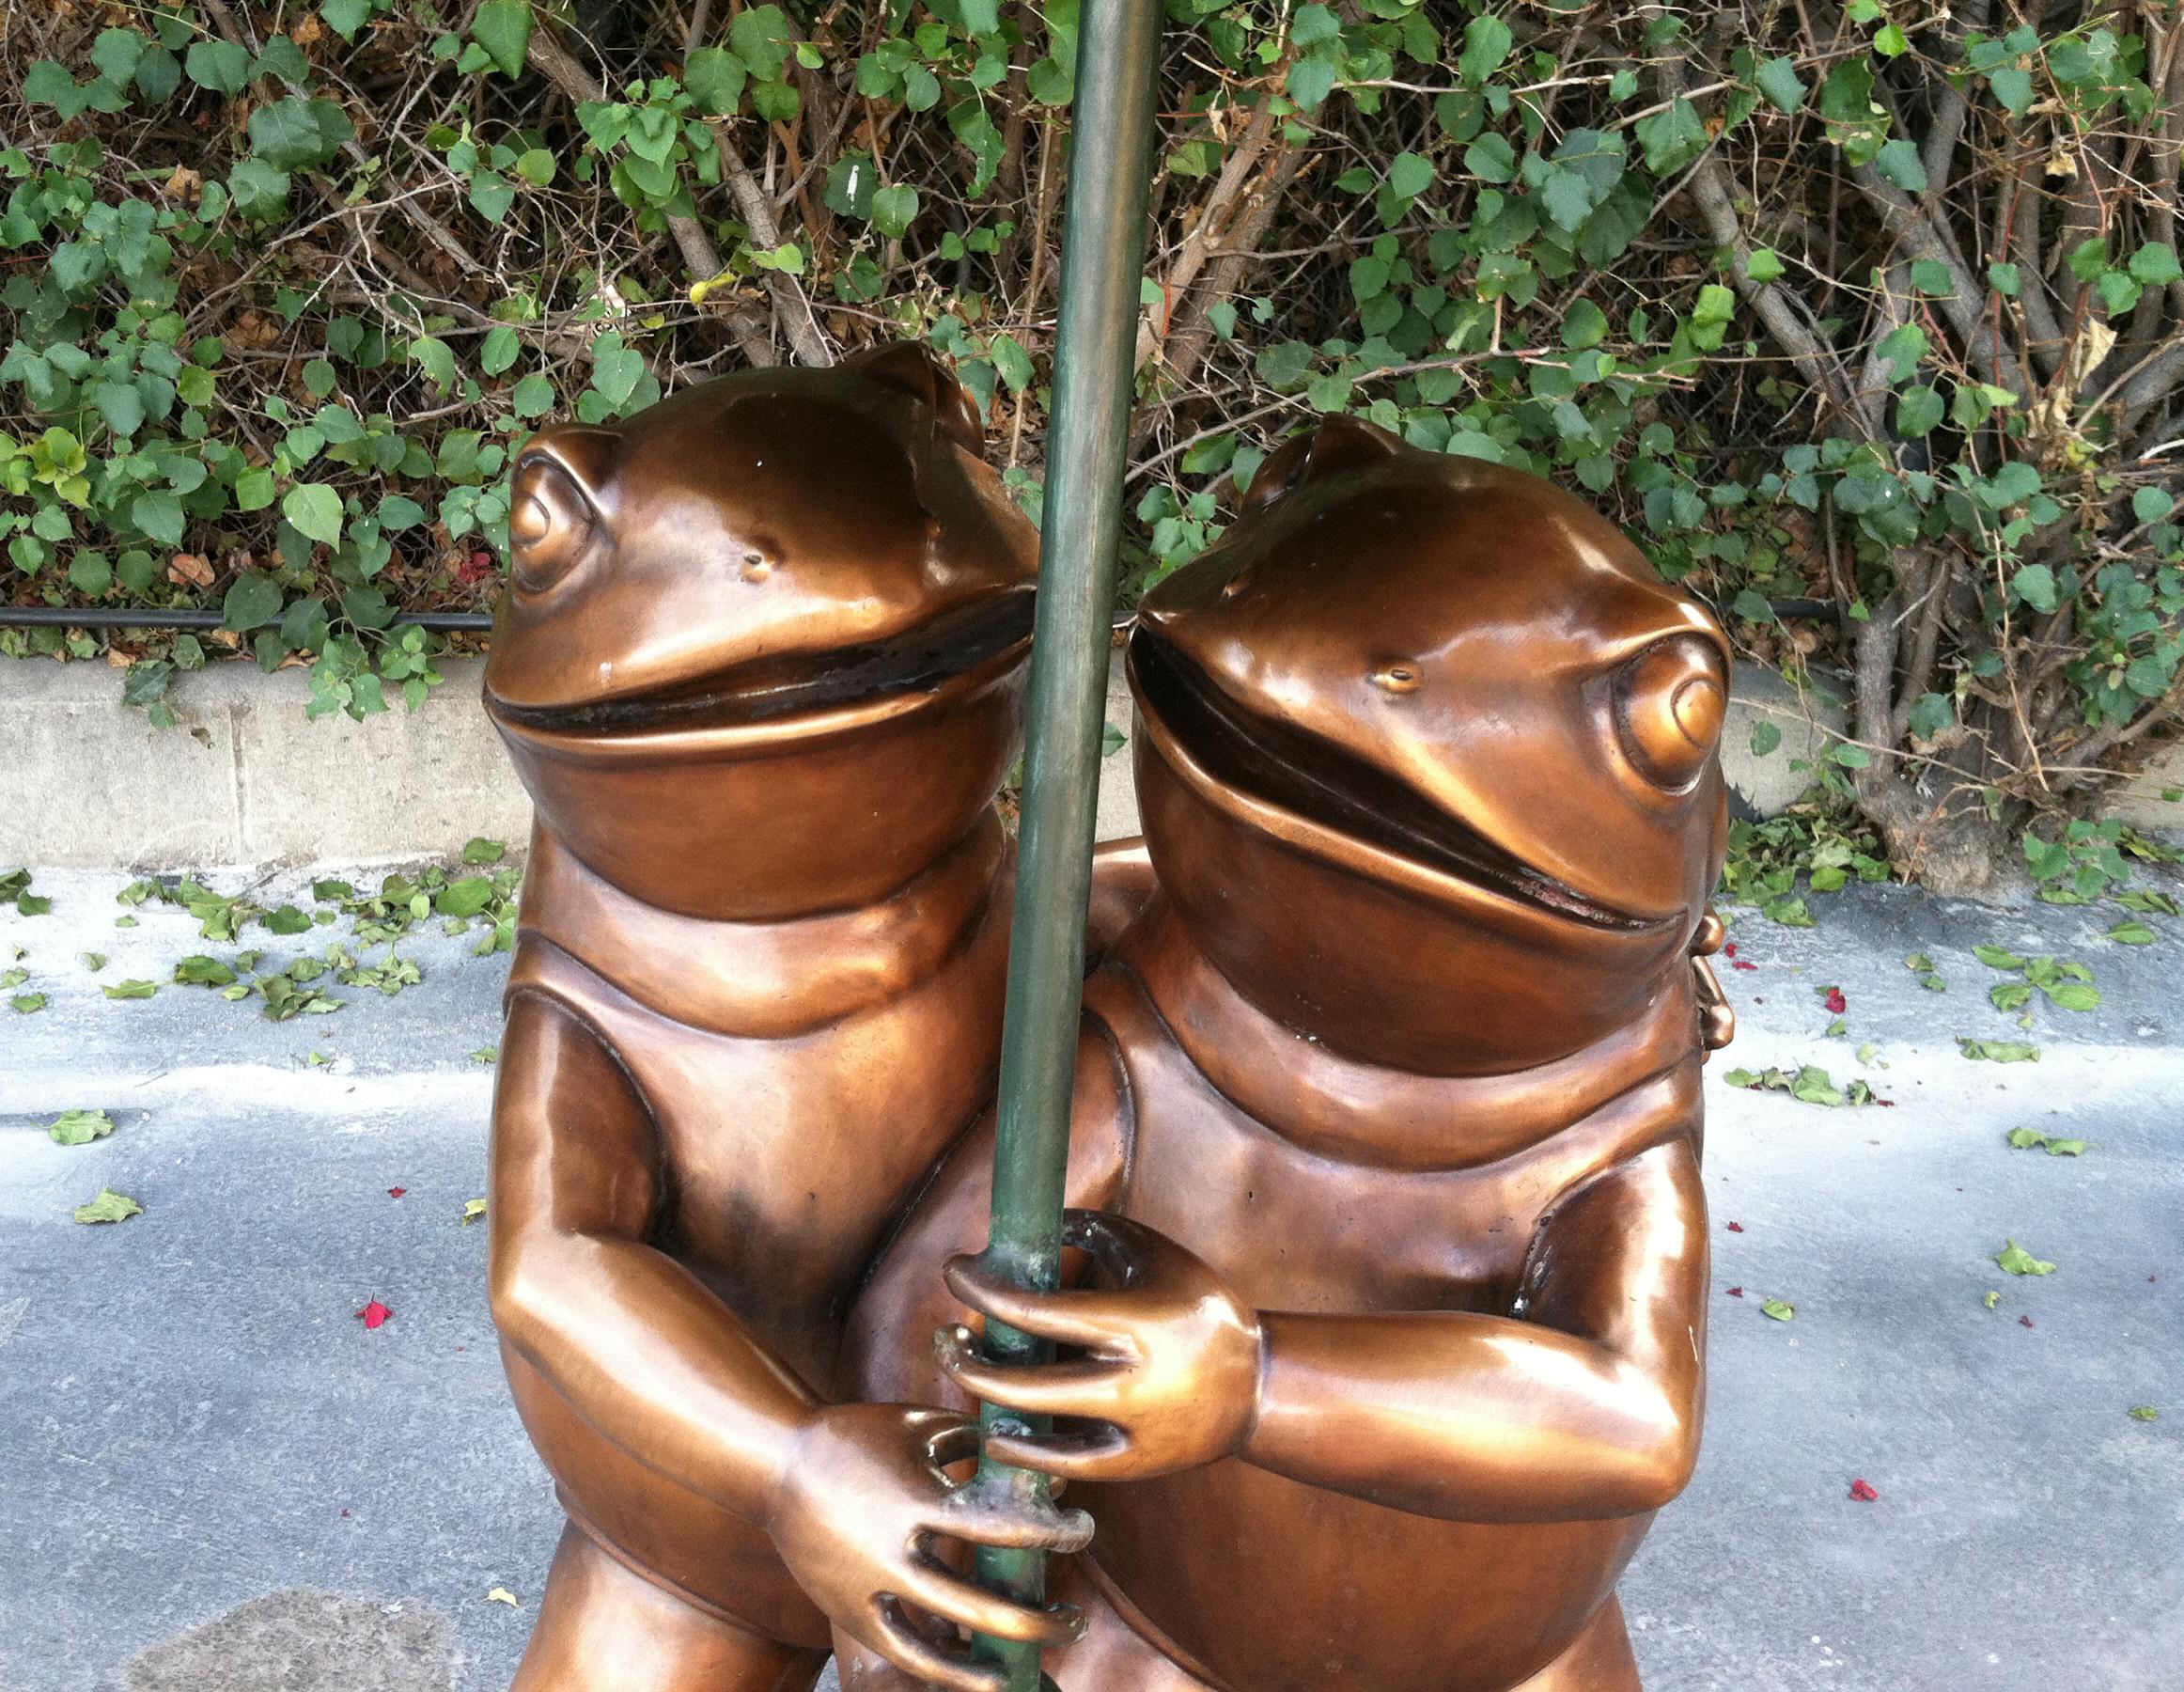 bronze statue of frogs under umbrella